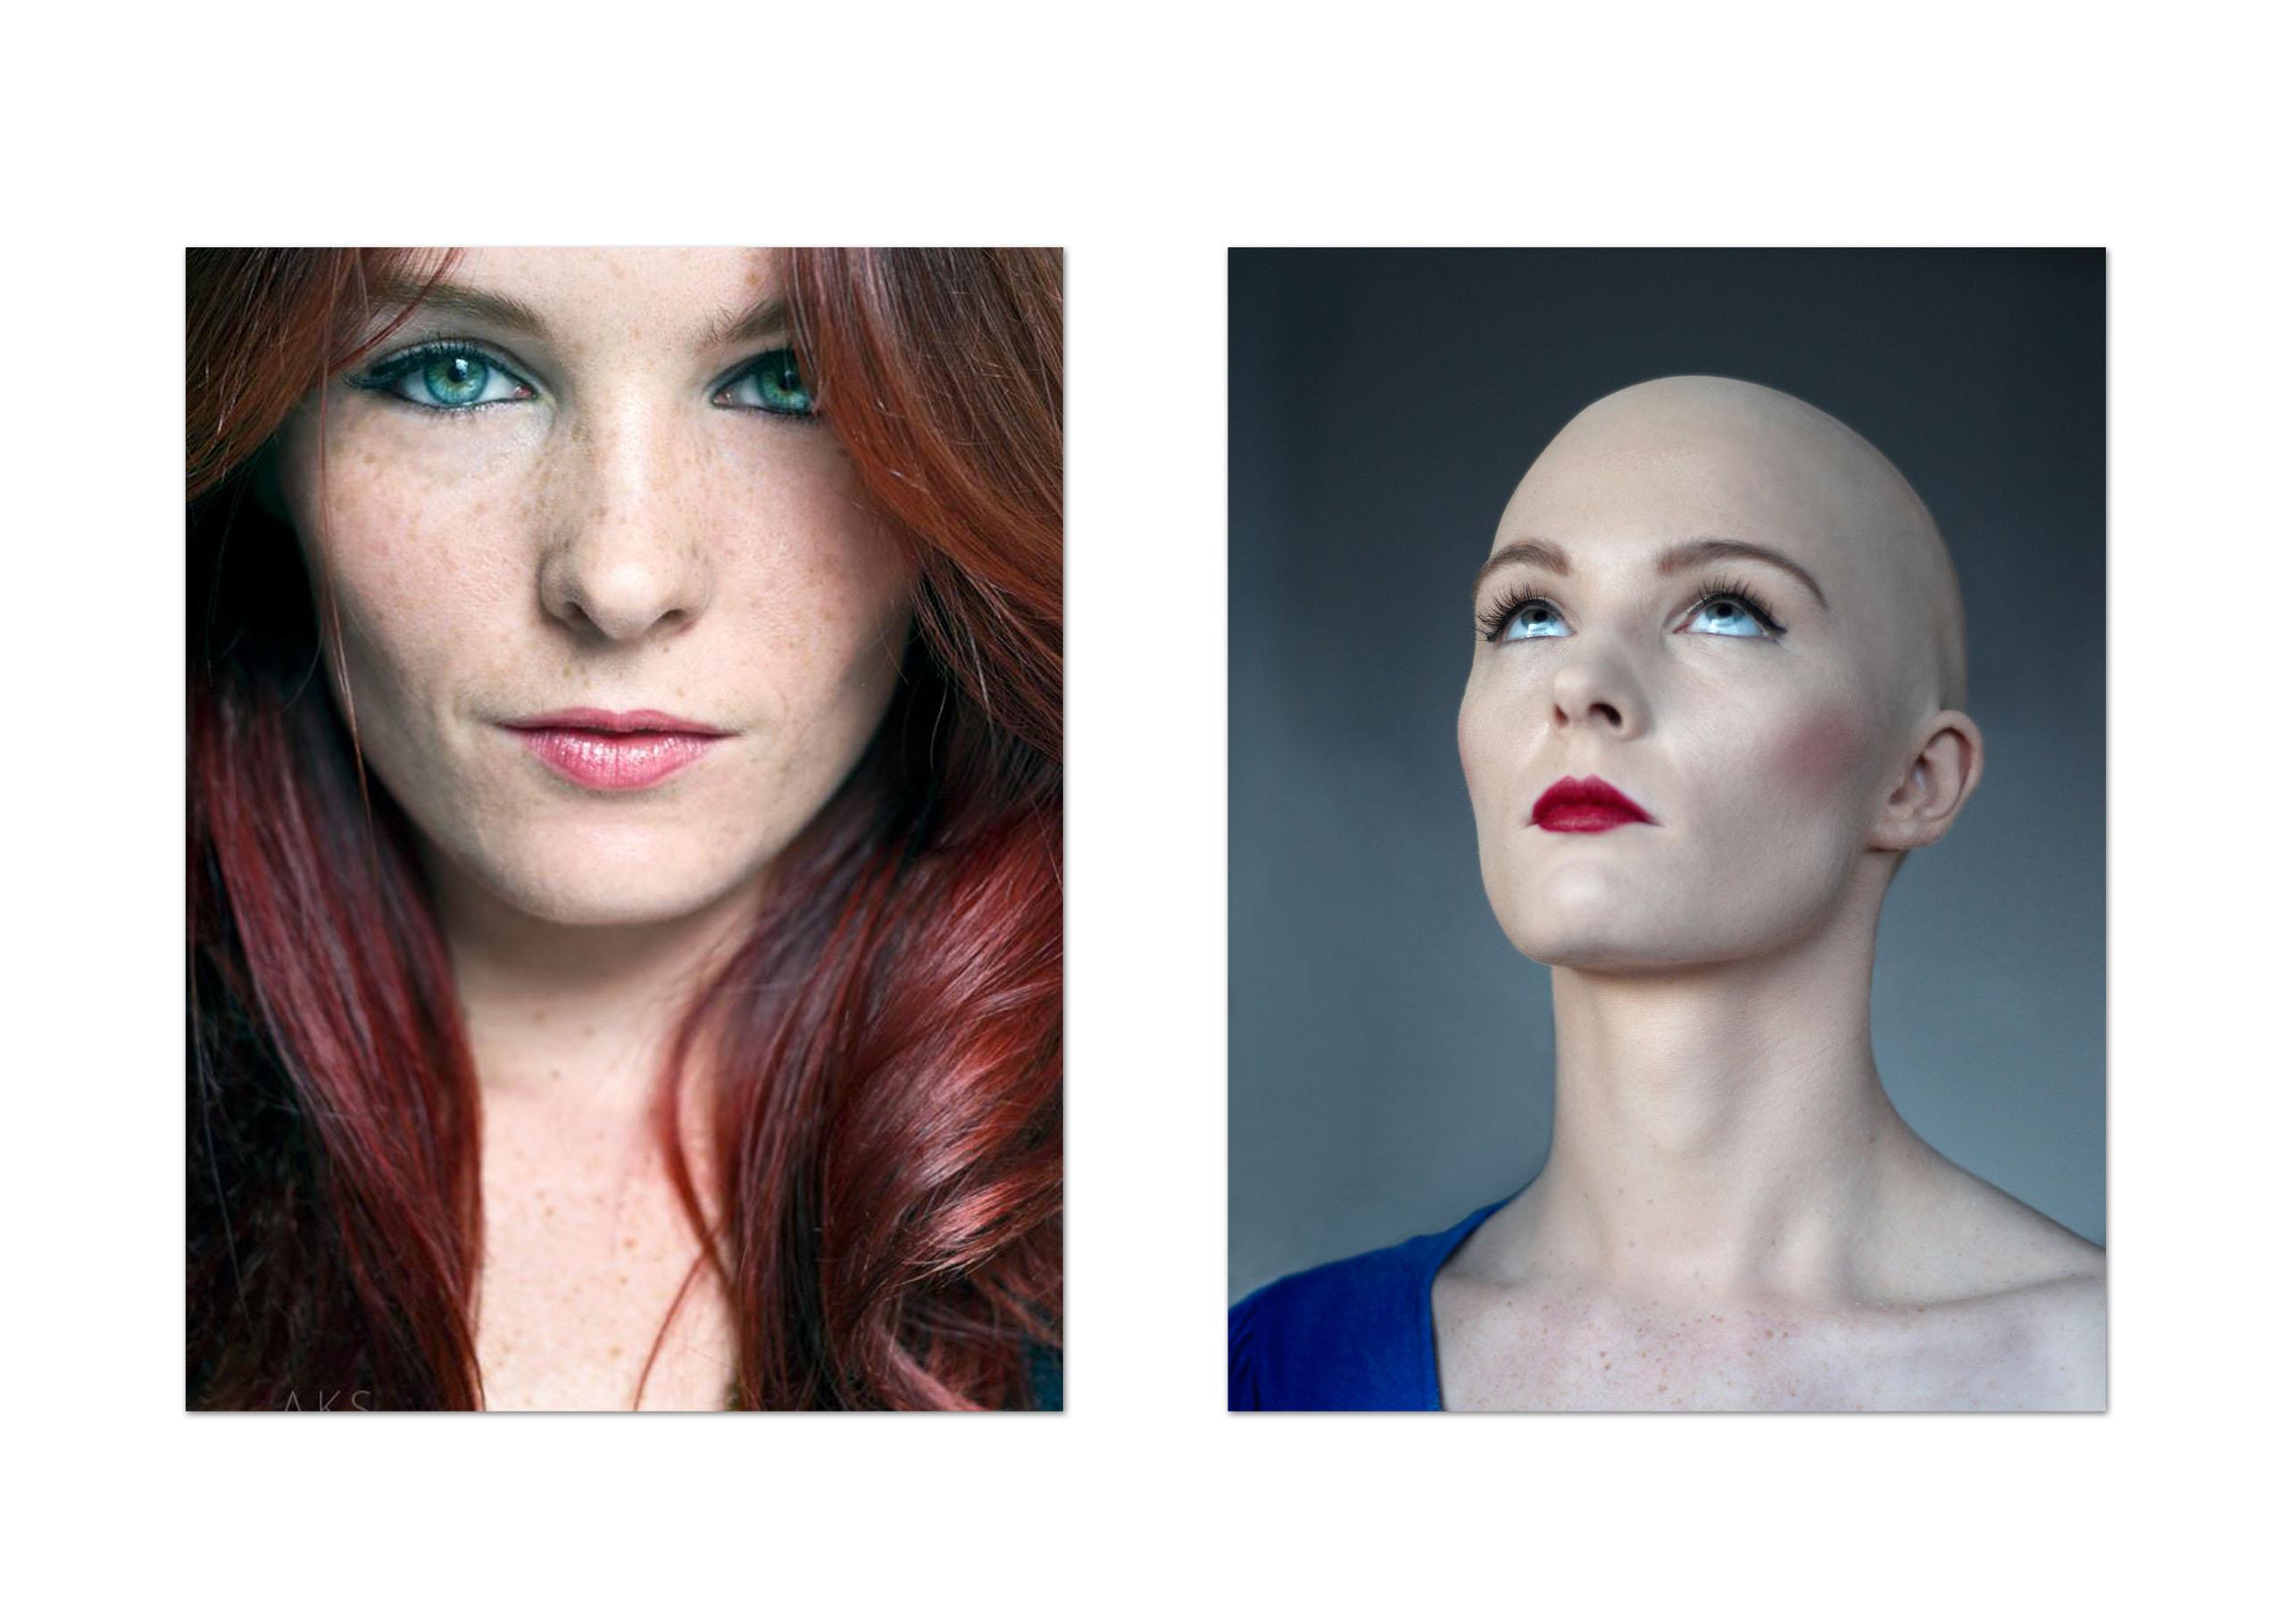 Hair fashion 2017 - February 2012 Skinheads Maximal Fx